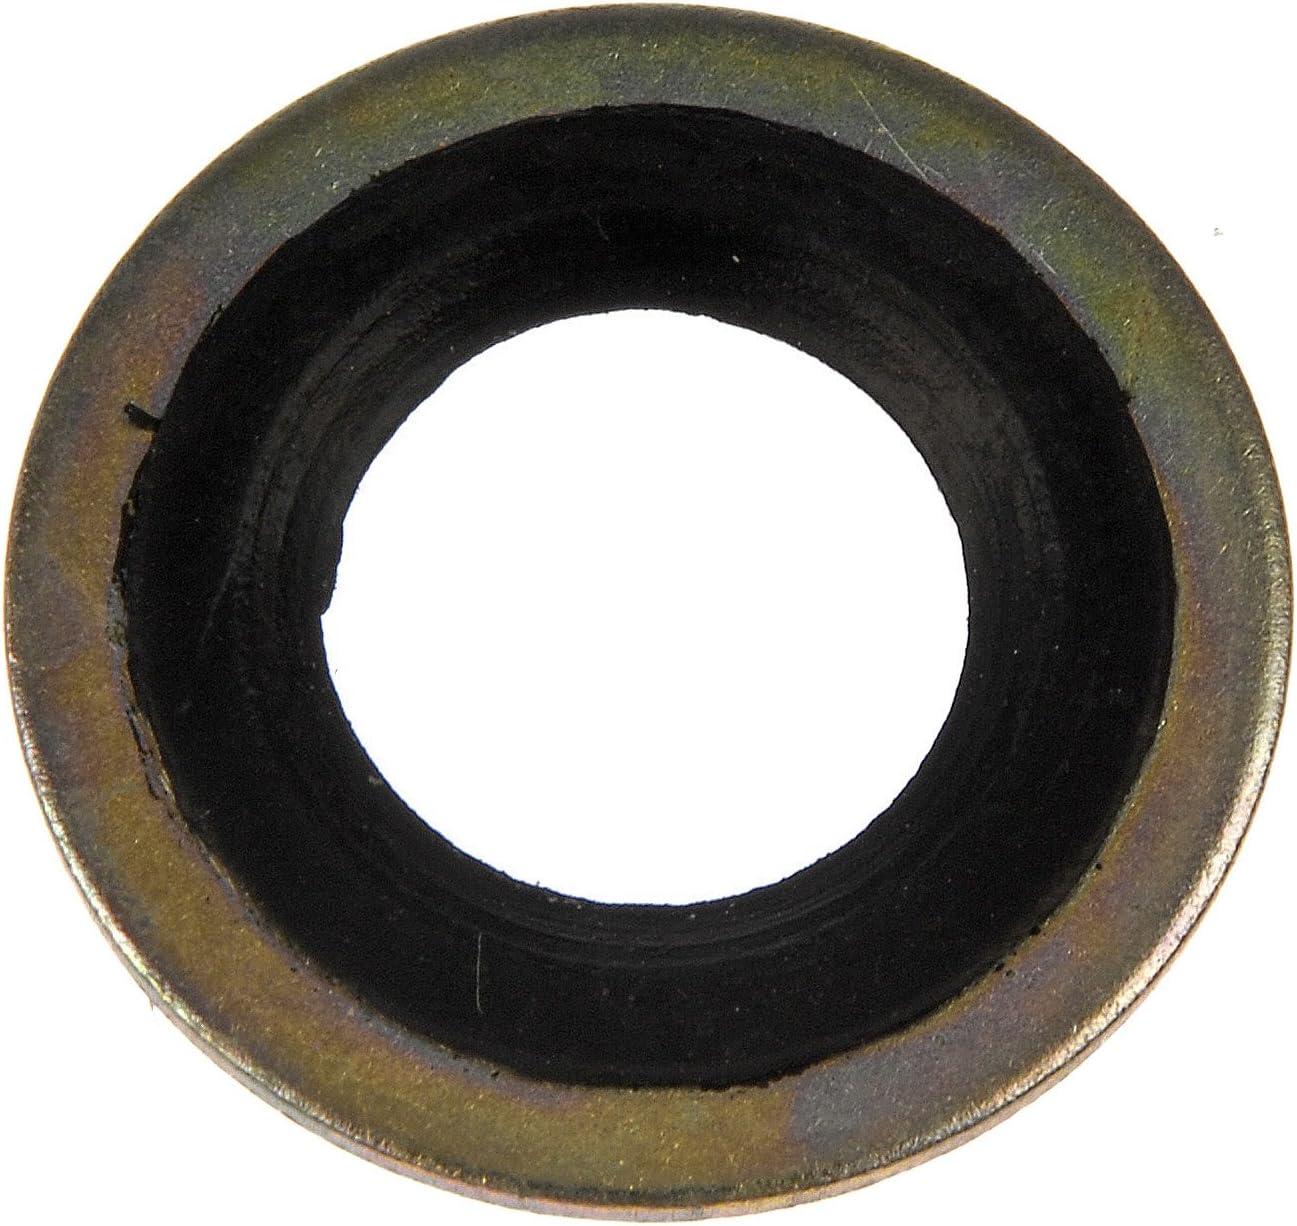 Genuine Ford Oil Pan Drain Plug Gasket F77Z-6734-AB